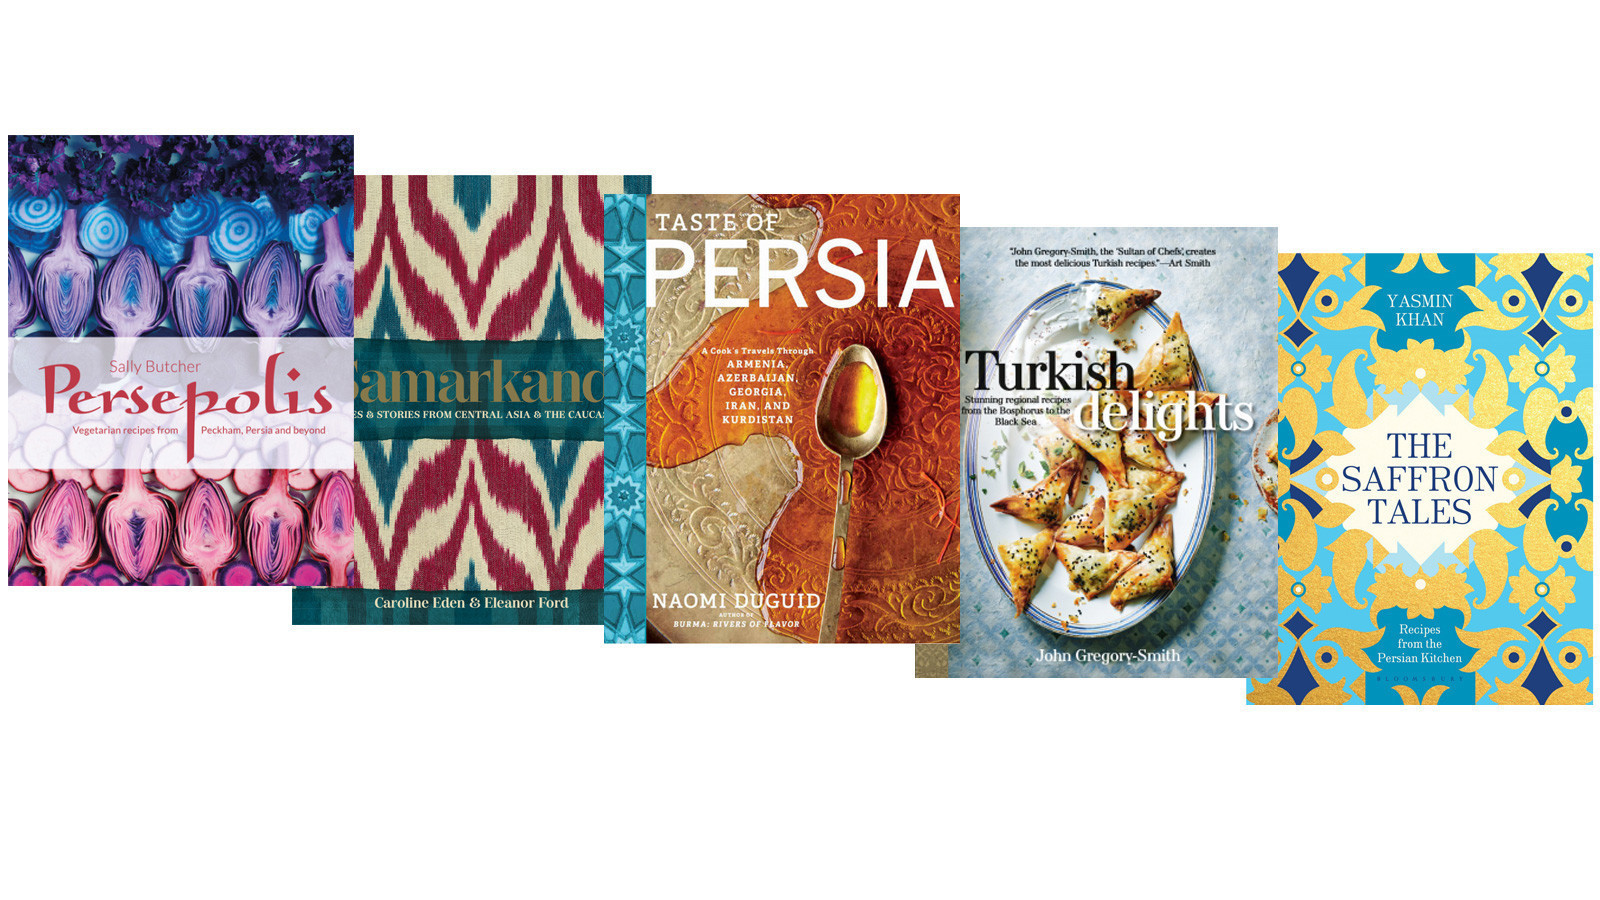 new cookbooks offer recipes for persian, turkish and uzbek cuisine